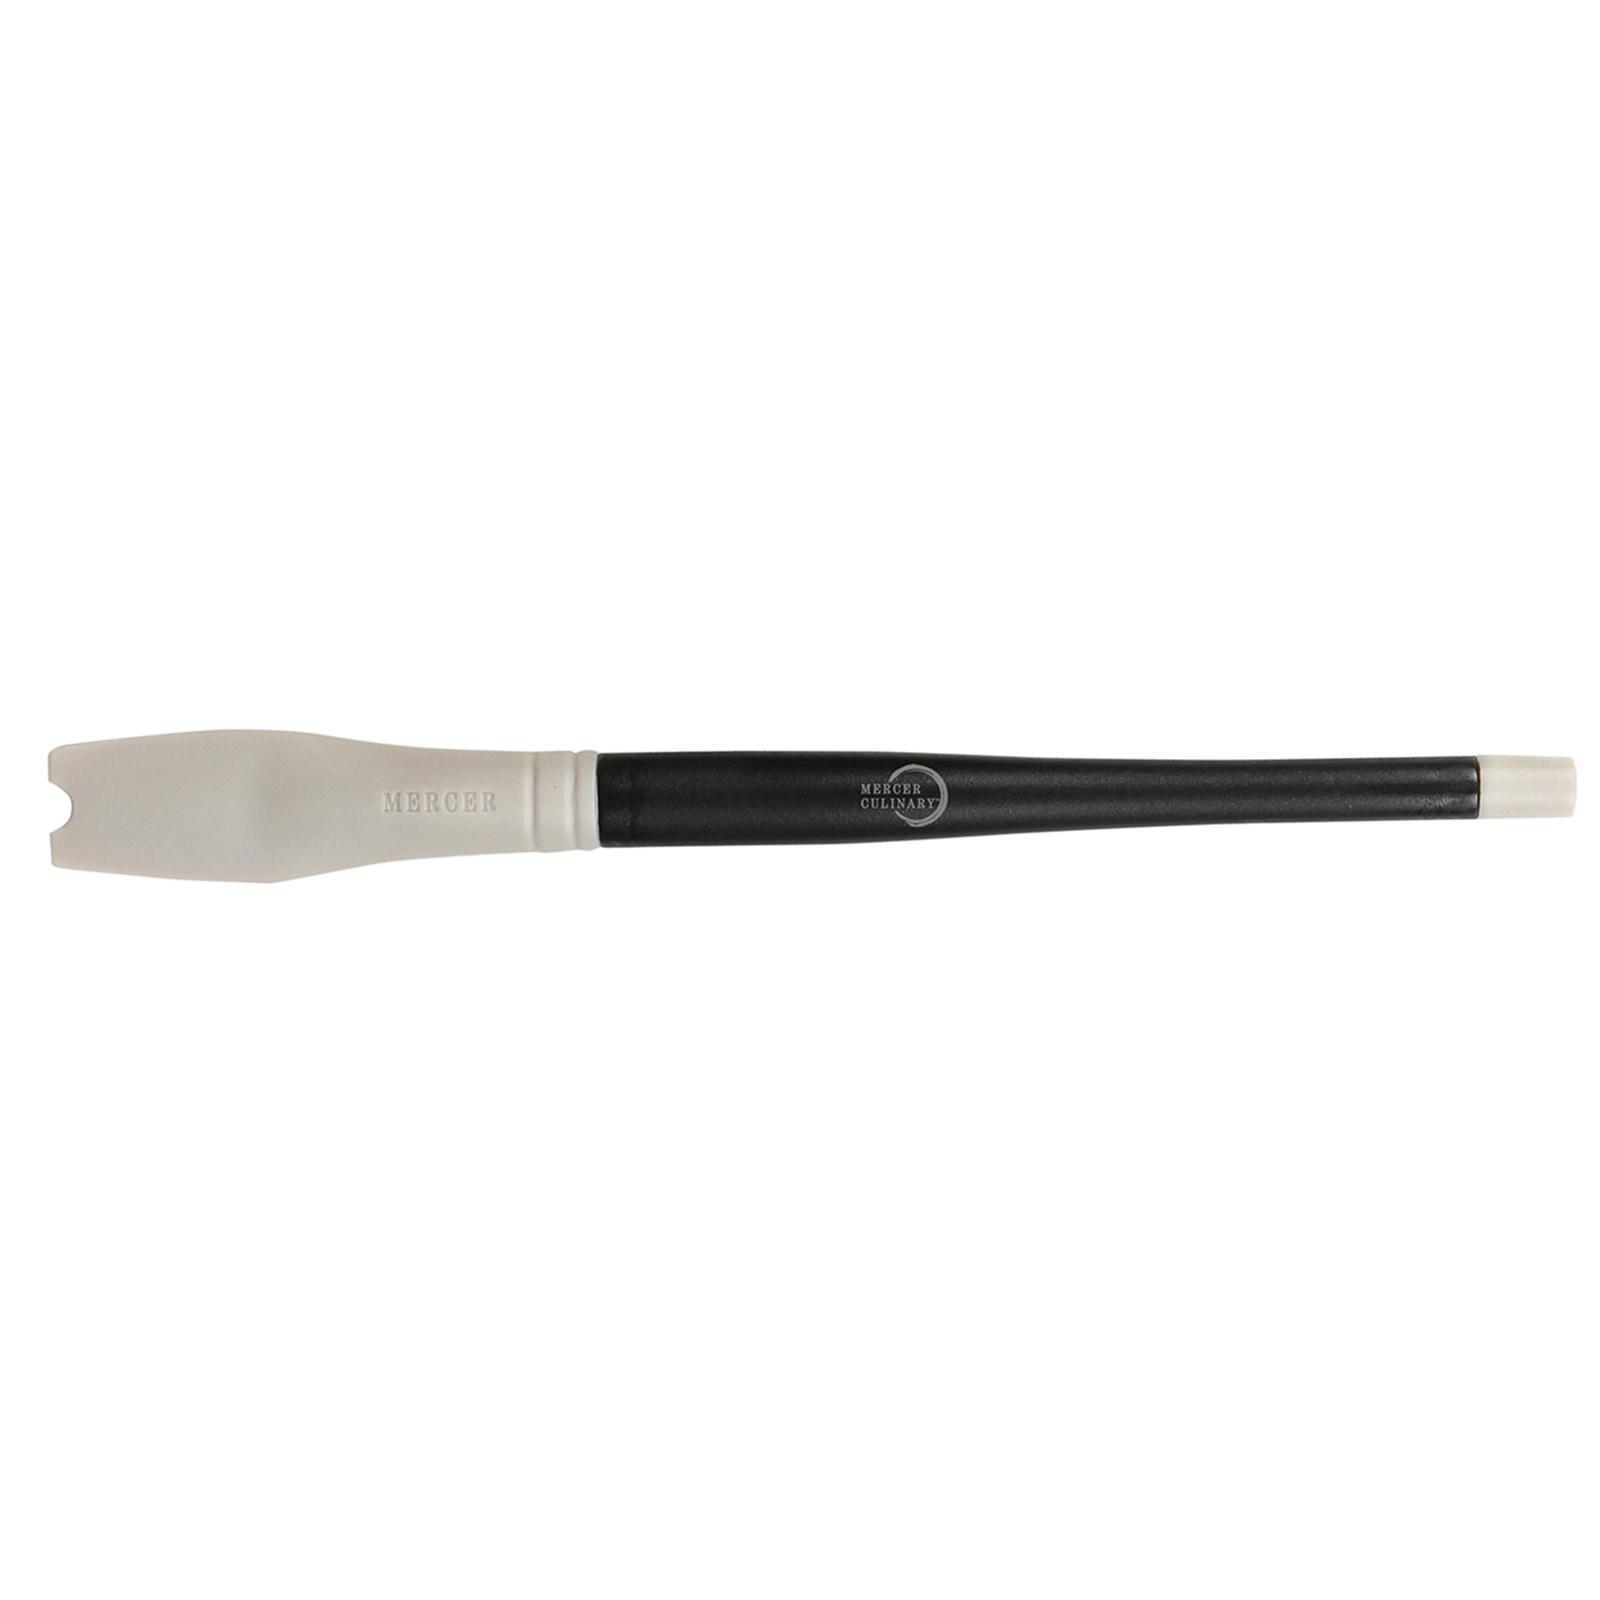 Mercer Culinary M35604 plating tool